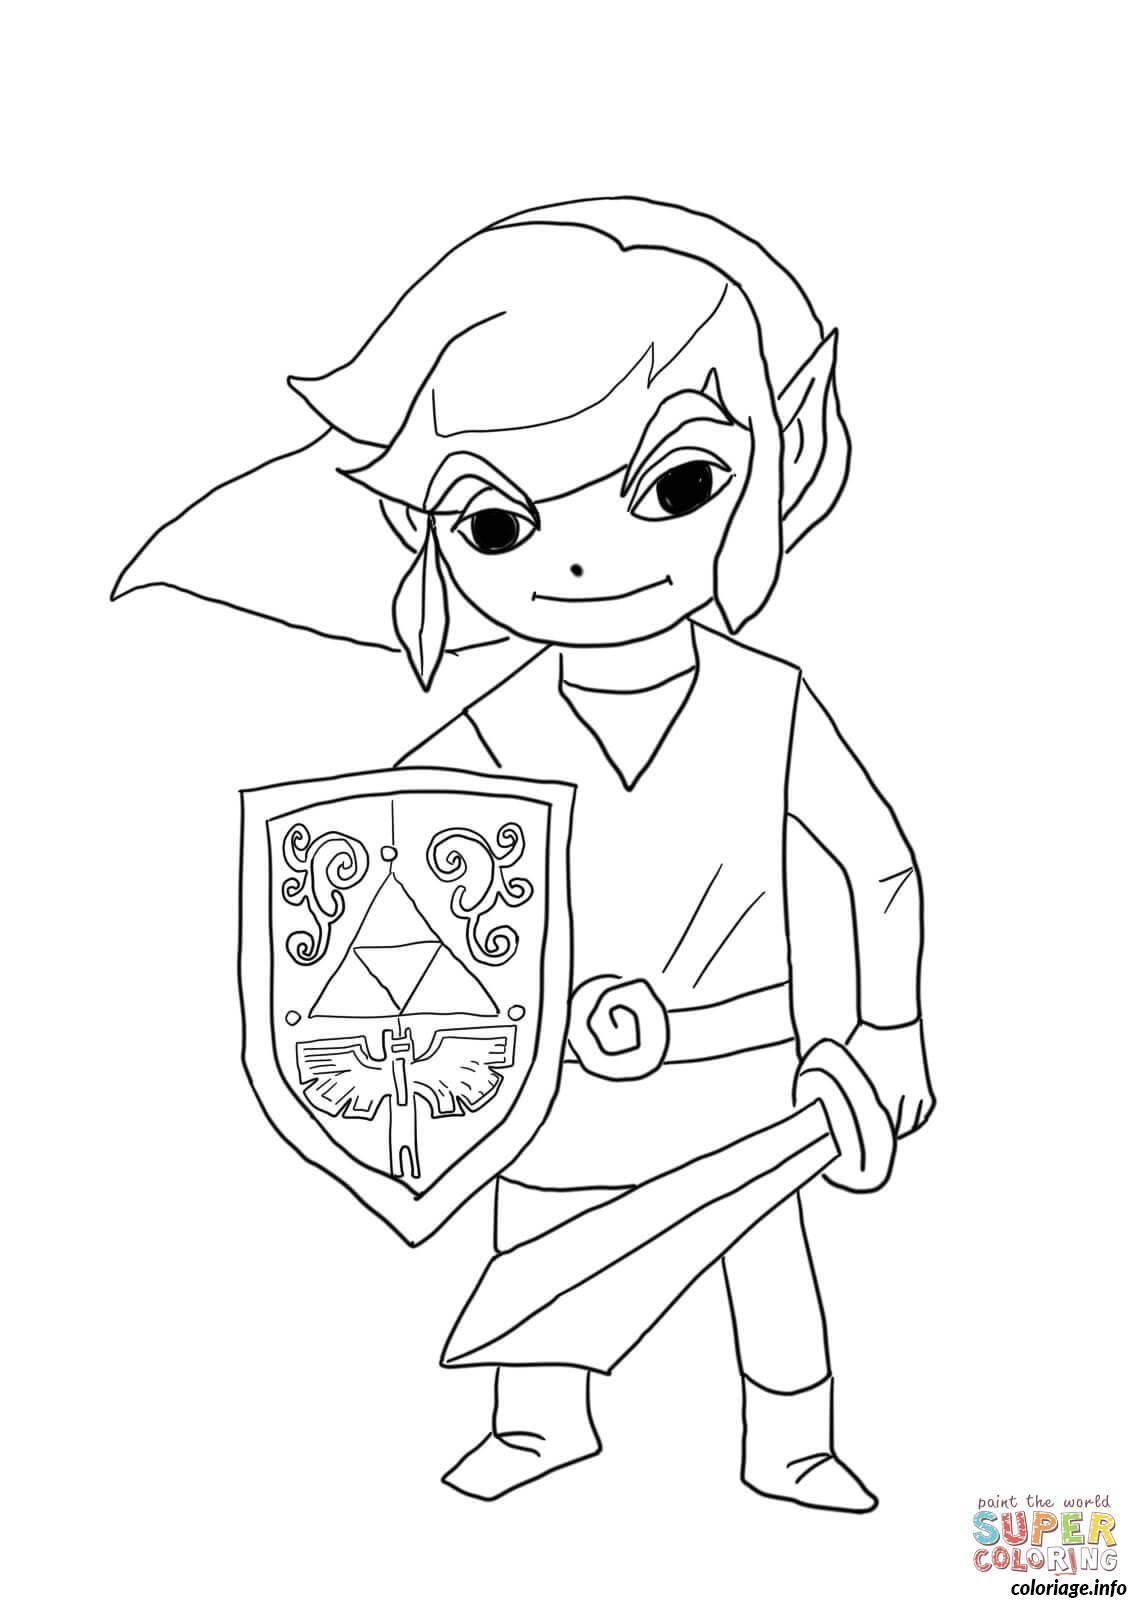 40 Dessins De Coloriage Zelda à Imprimer